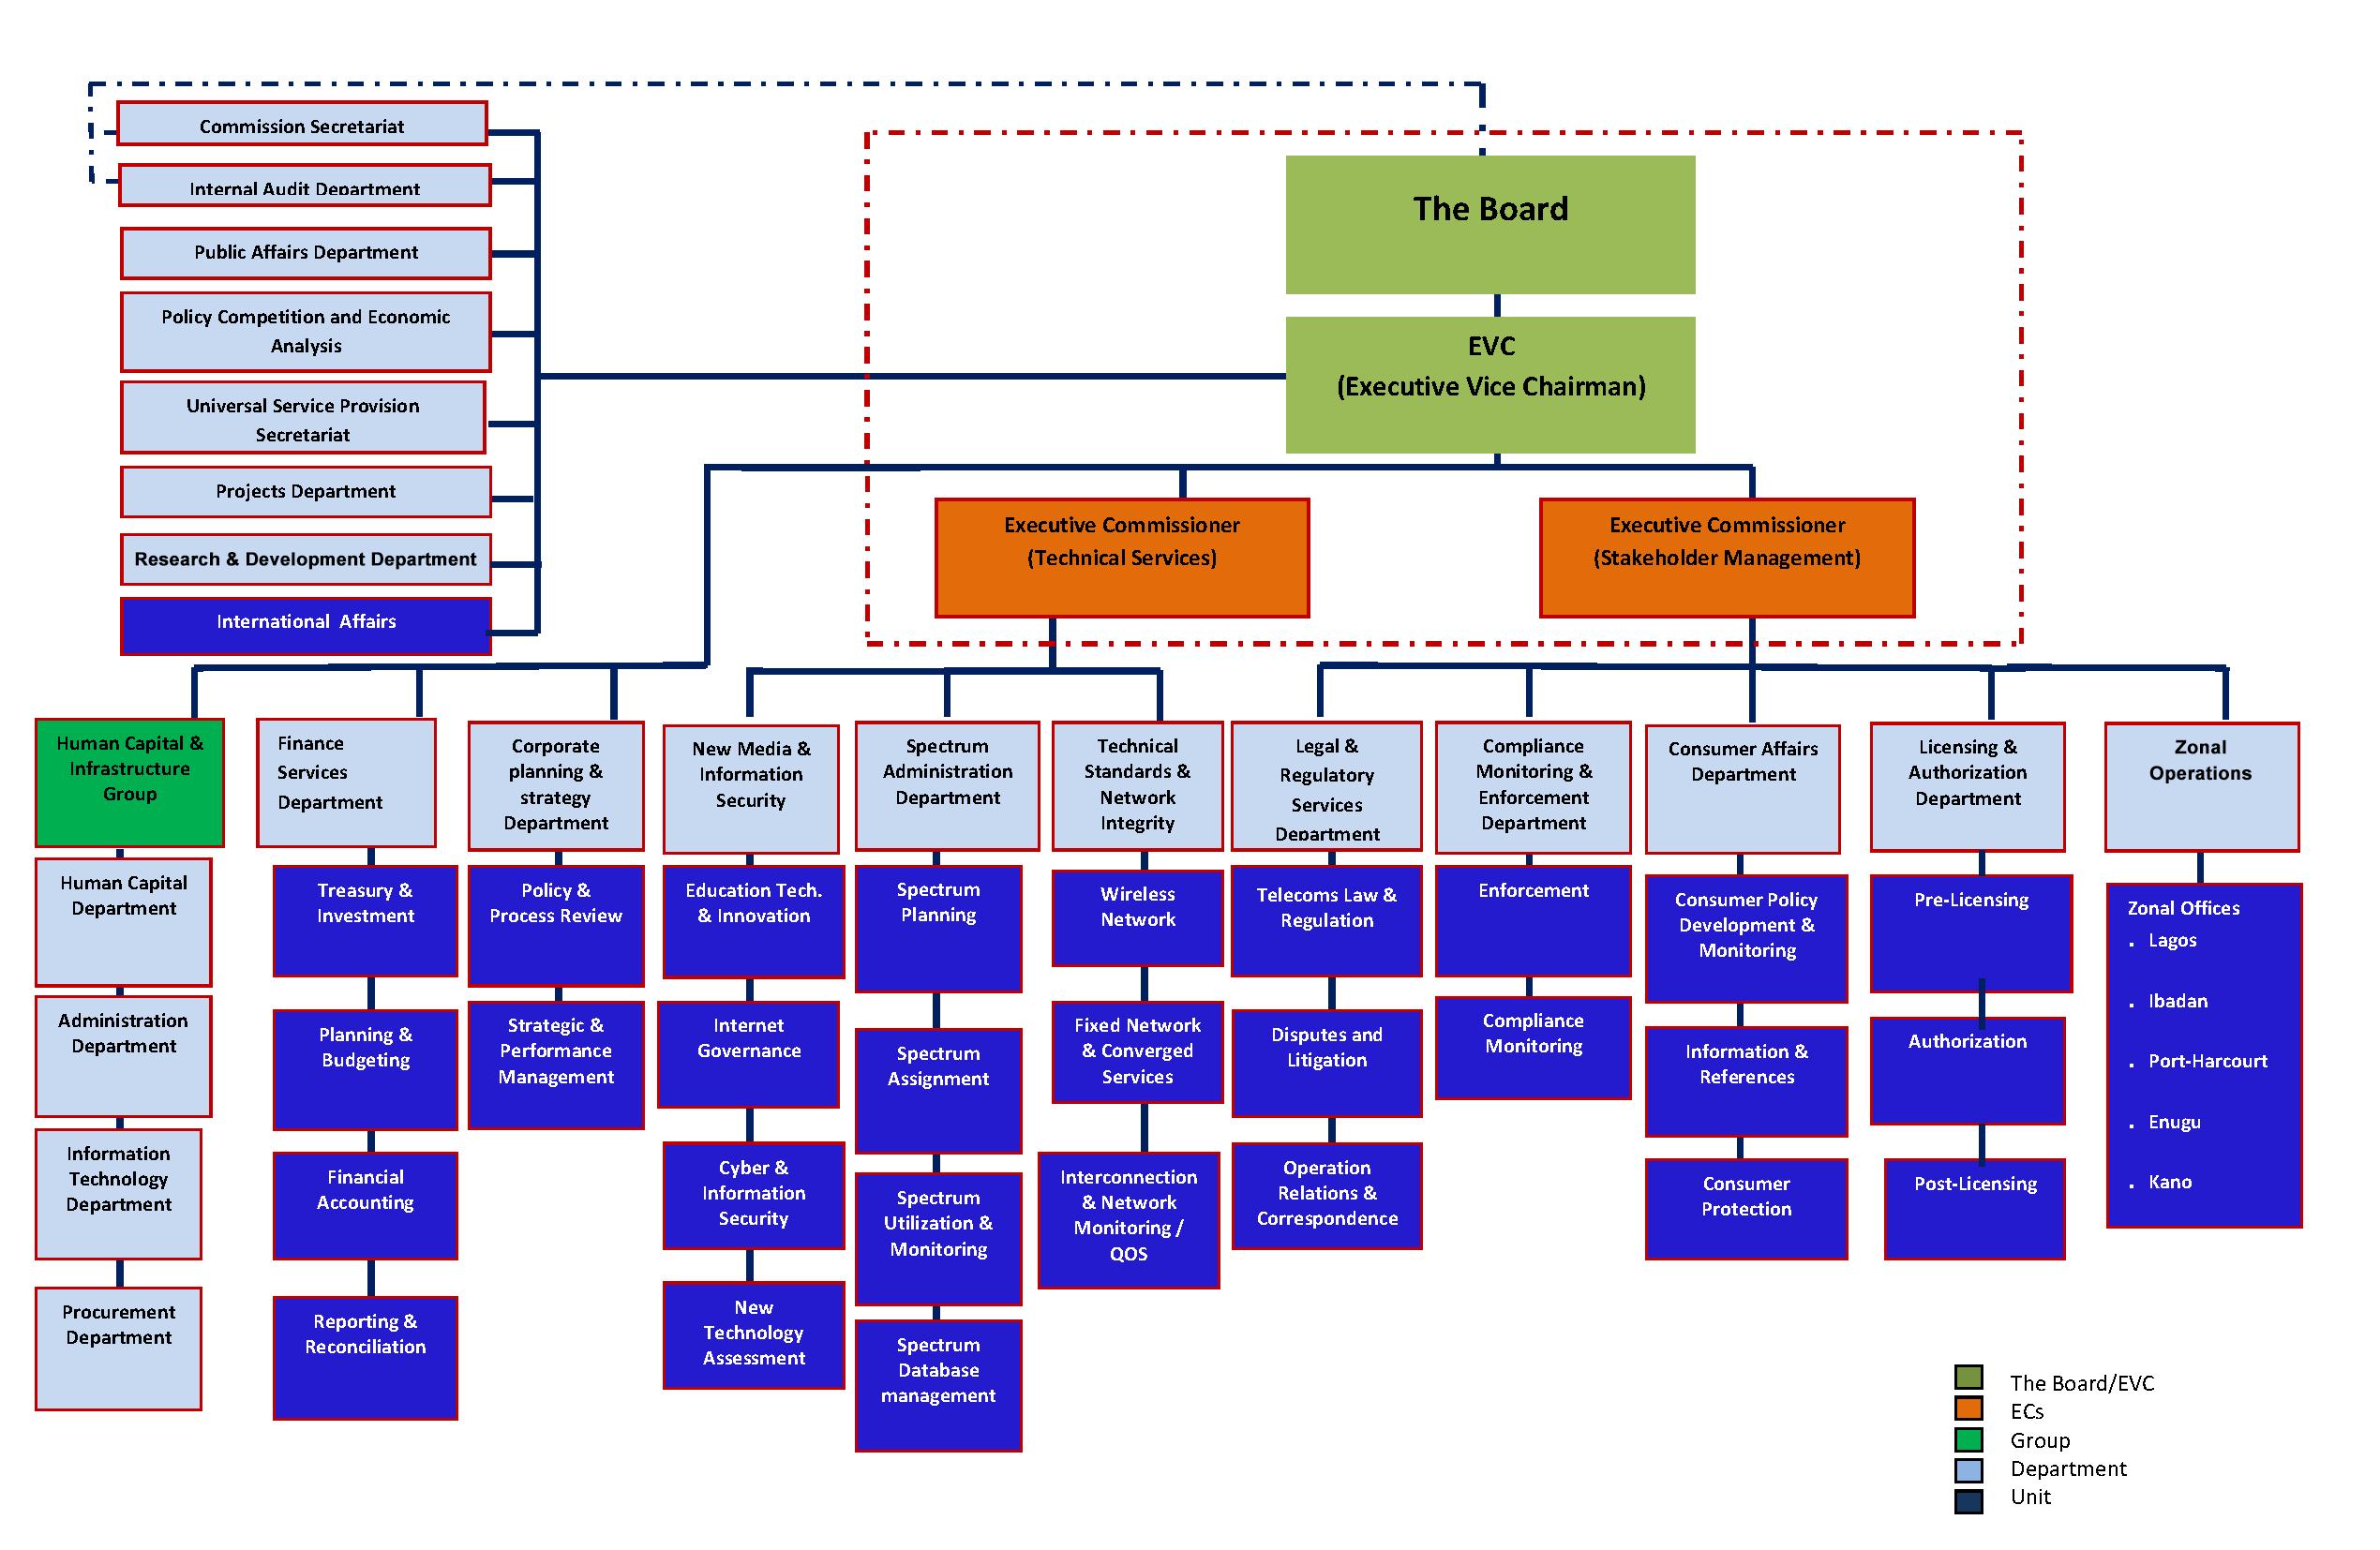 hotel organisational analysis Intercontinental hotel, houston, texas, april 2005 workforce planning tool kit swot analysis examples 5  starbucks swot analysis  strengths.